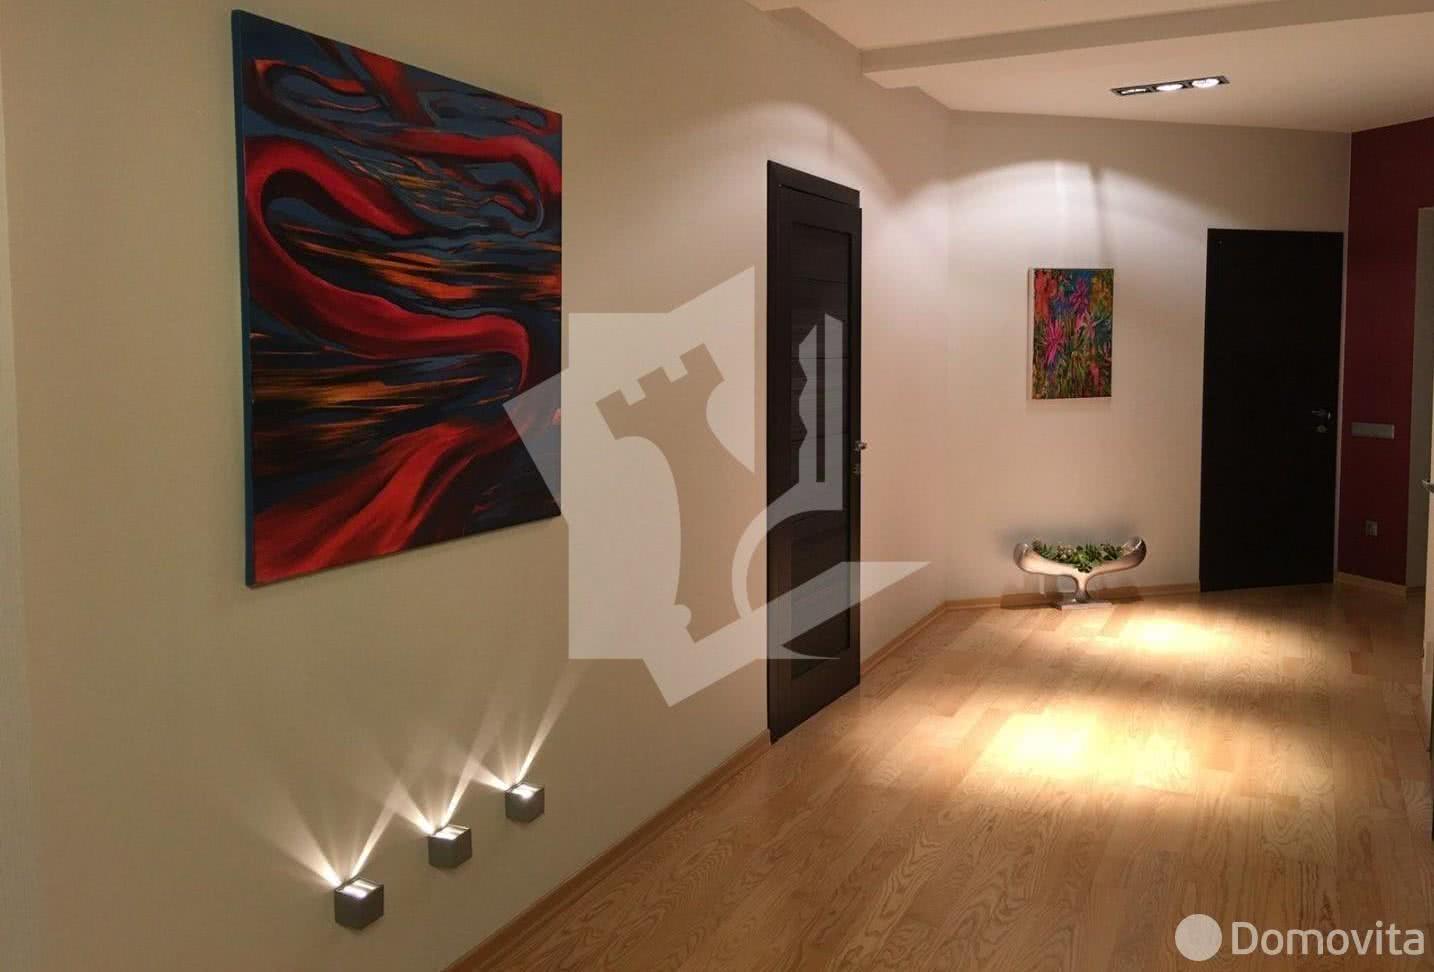 Аренда 3-комнатной квартиры в Минске, Старовиленский тр-т, д. 10 - фото 4